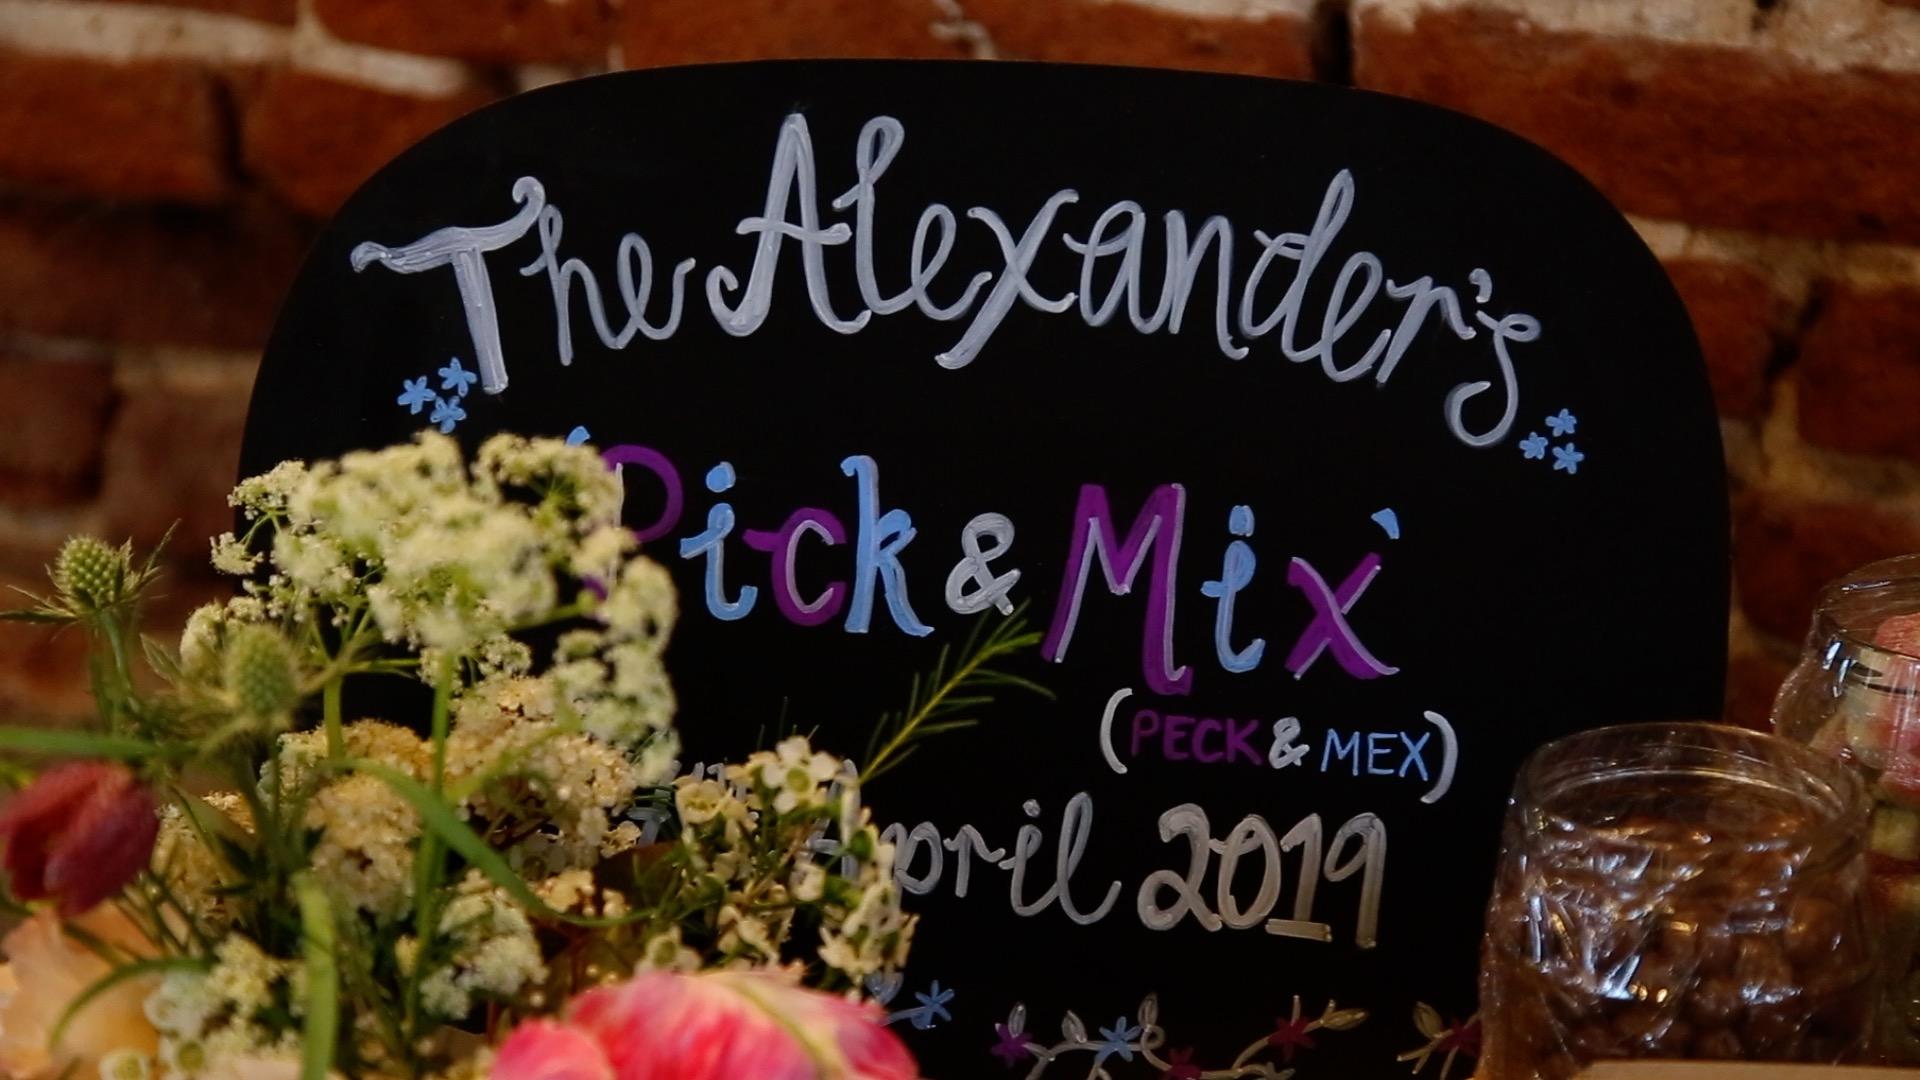 Molly & Jack - Full edit sweets.jpg